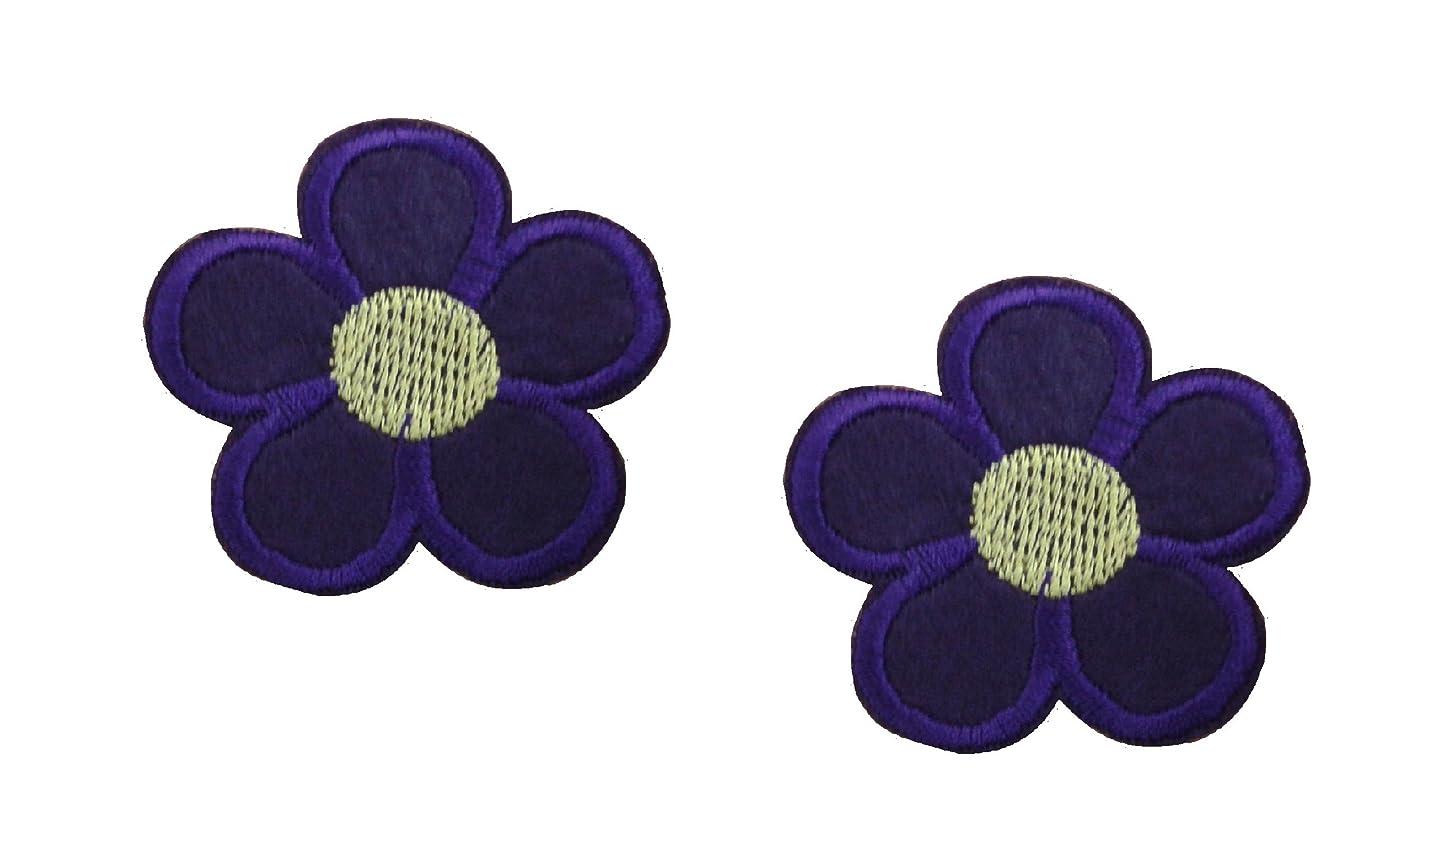 2 pieces Purple FLOWER Iron On Patch Fabric Applique Motif Children Scrapbooking Decal 1.9 x 1.9 inches (4.8 x 4.8 cm)